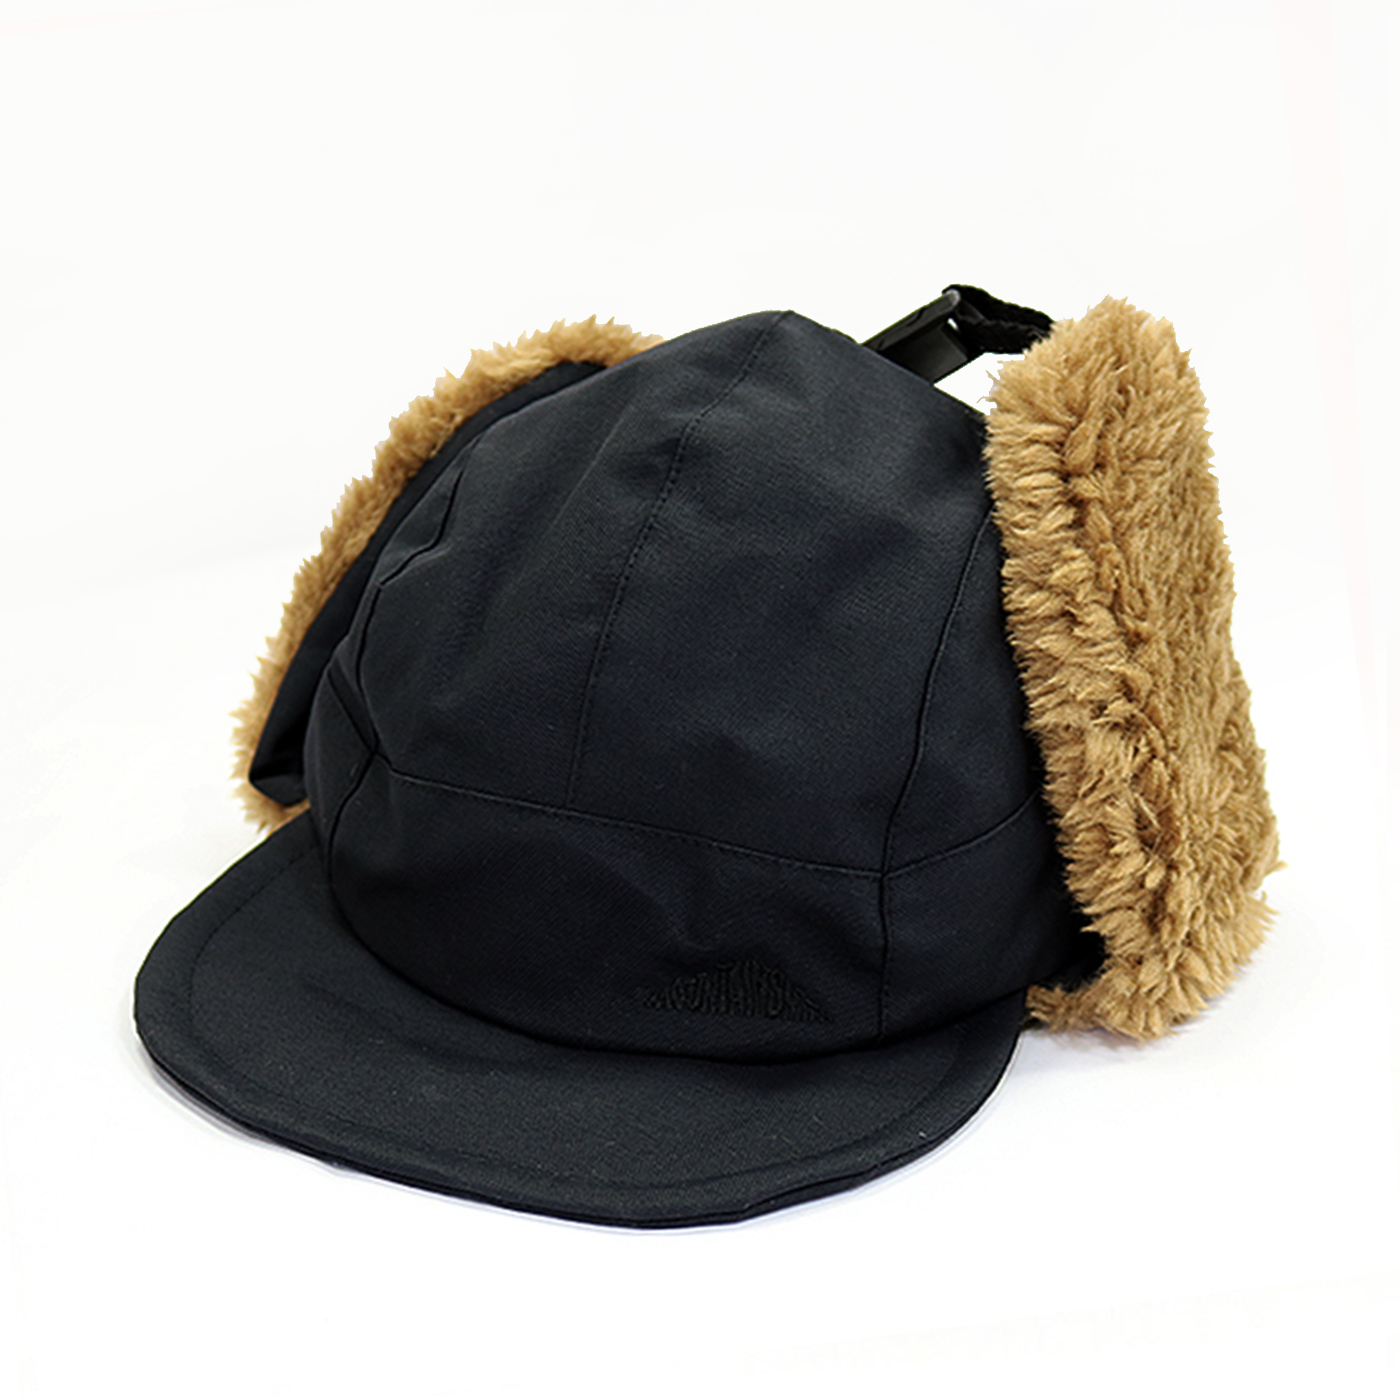 product: RE NYLON EARS CAP / color: BLACK 1